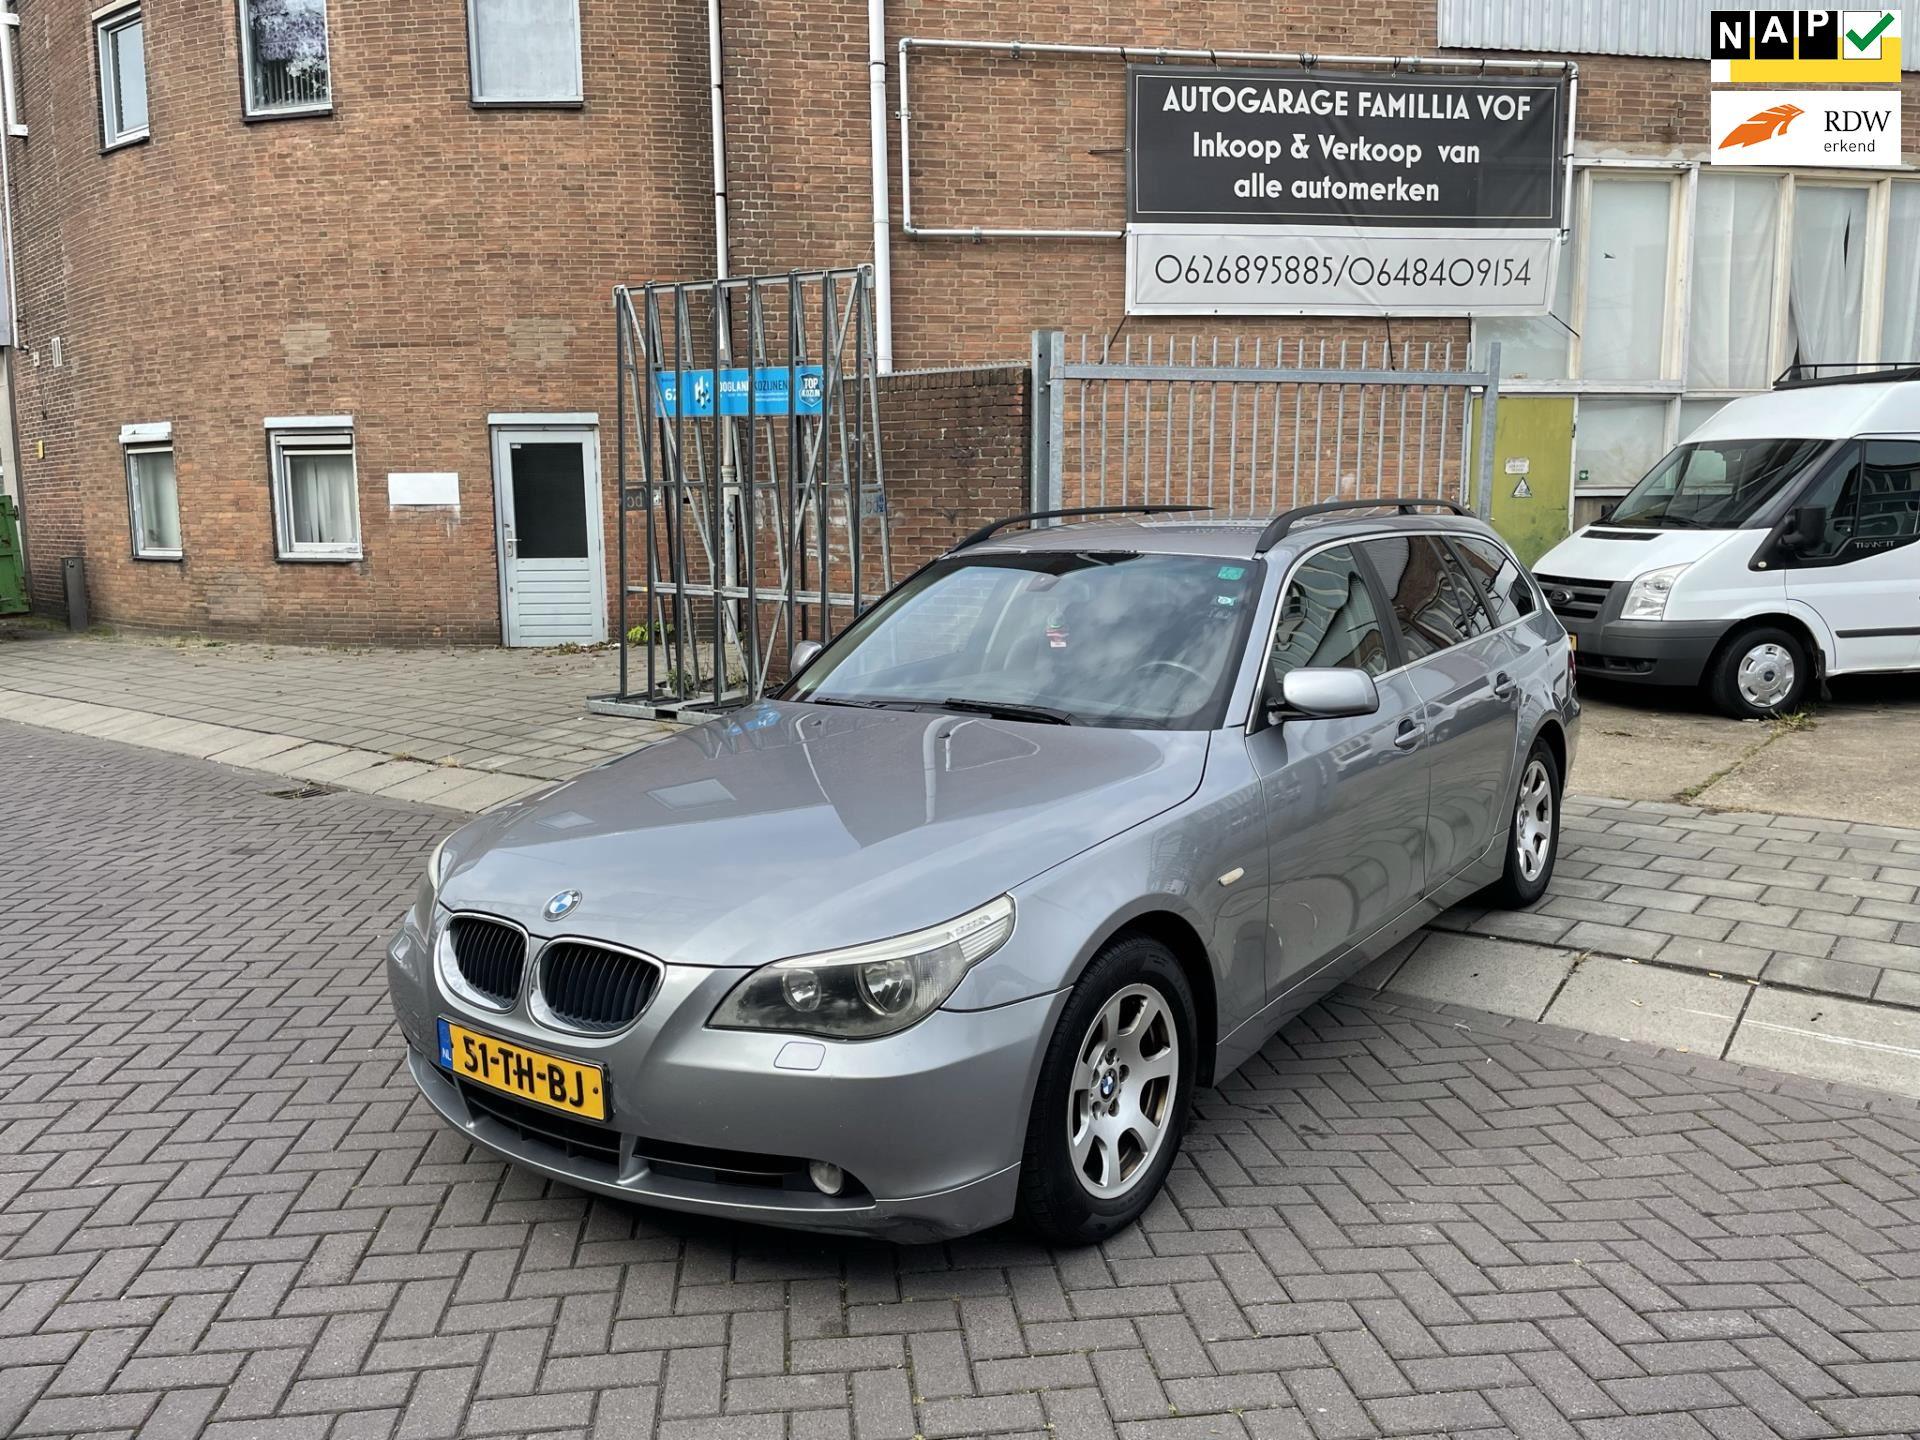 BMW 5-serie Touring occasion - Autogarage Famillia